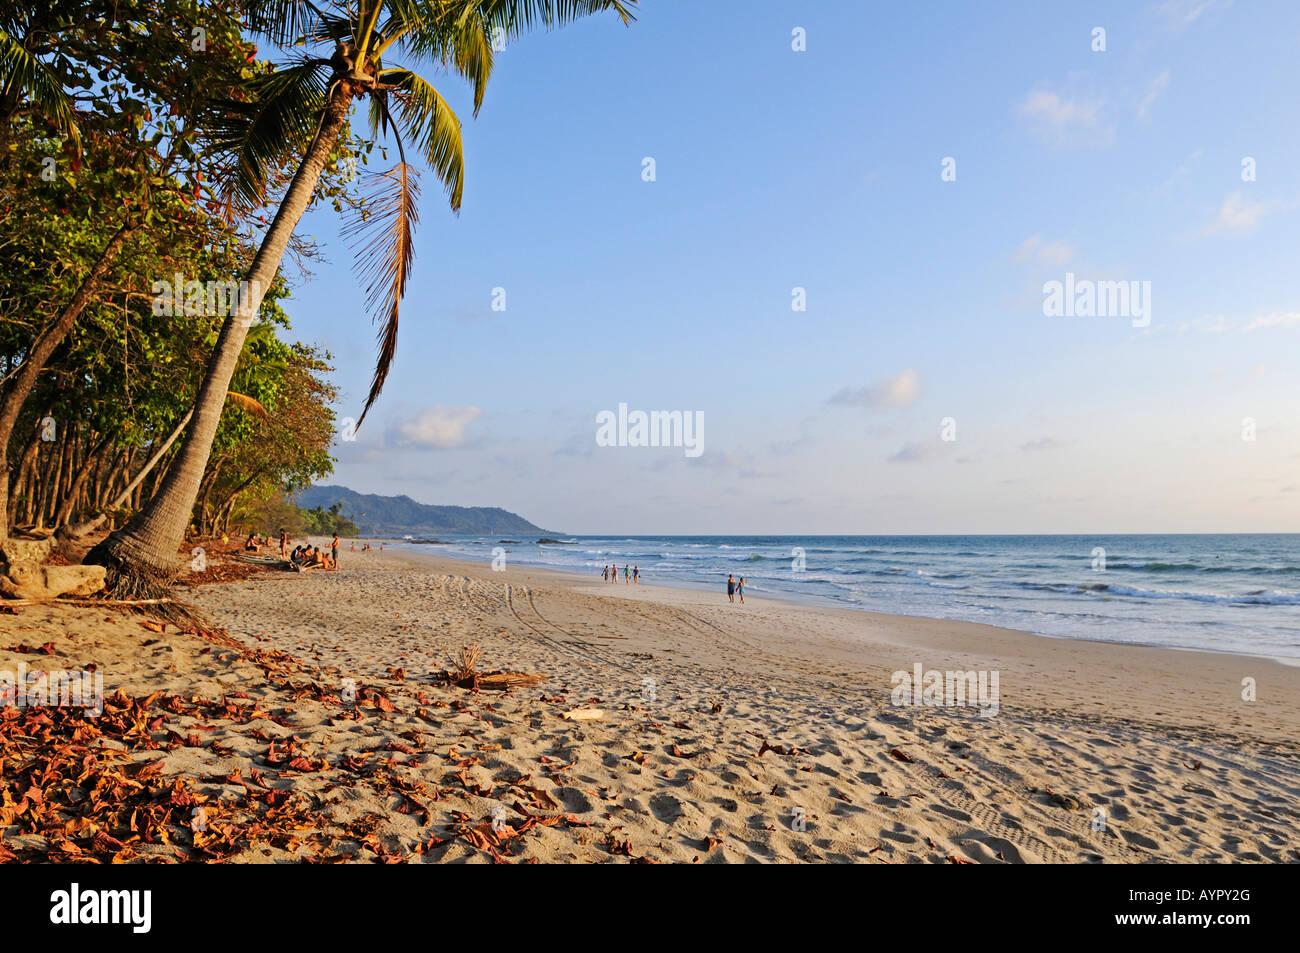 Plage de Santa Teresa, Mal Pais, Péninsule de Nicoya, Costa Rica, Amérique Centrale Photo Stock